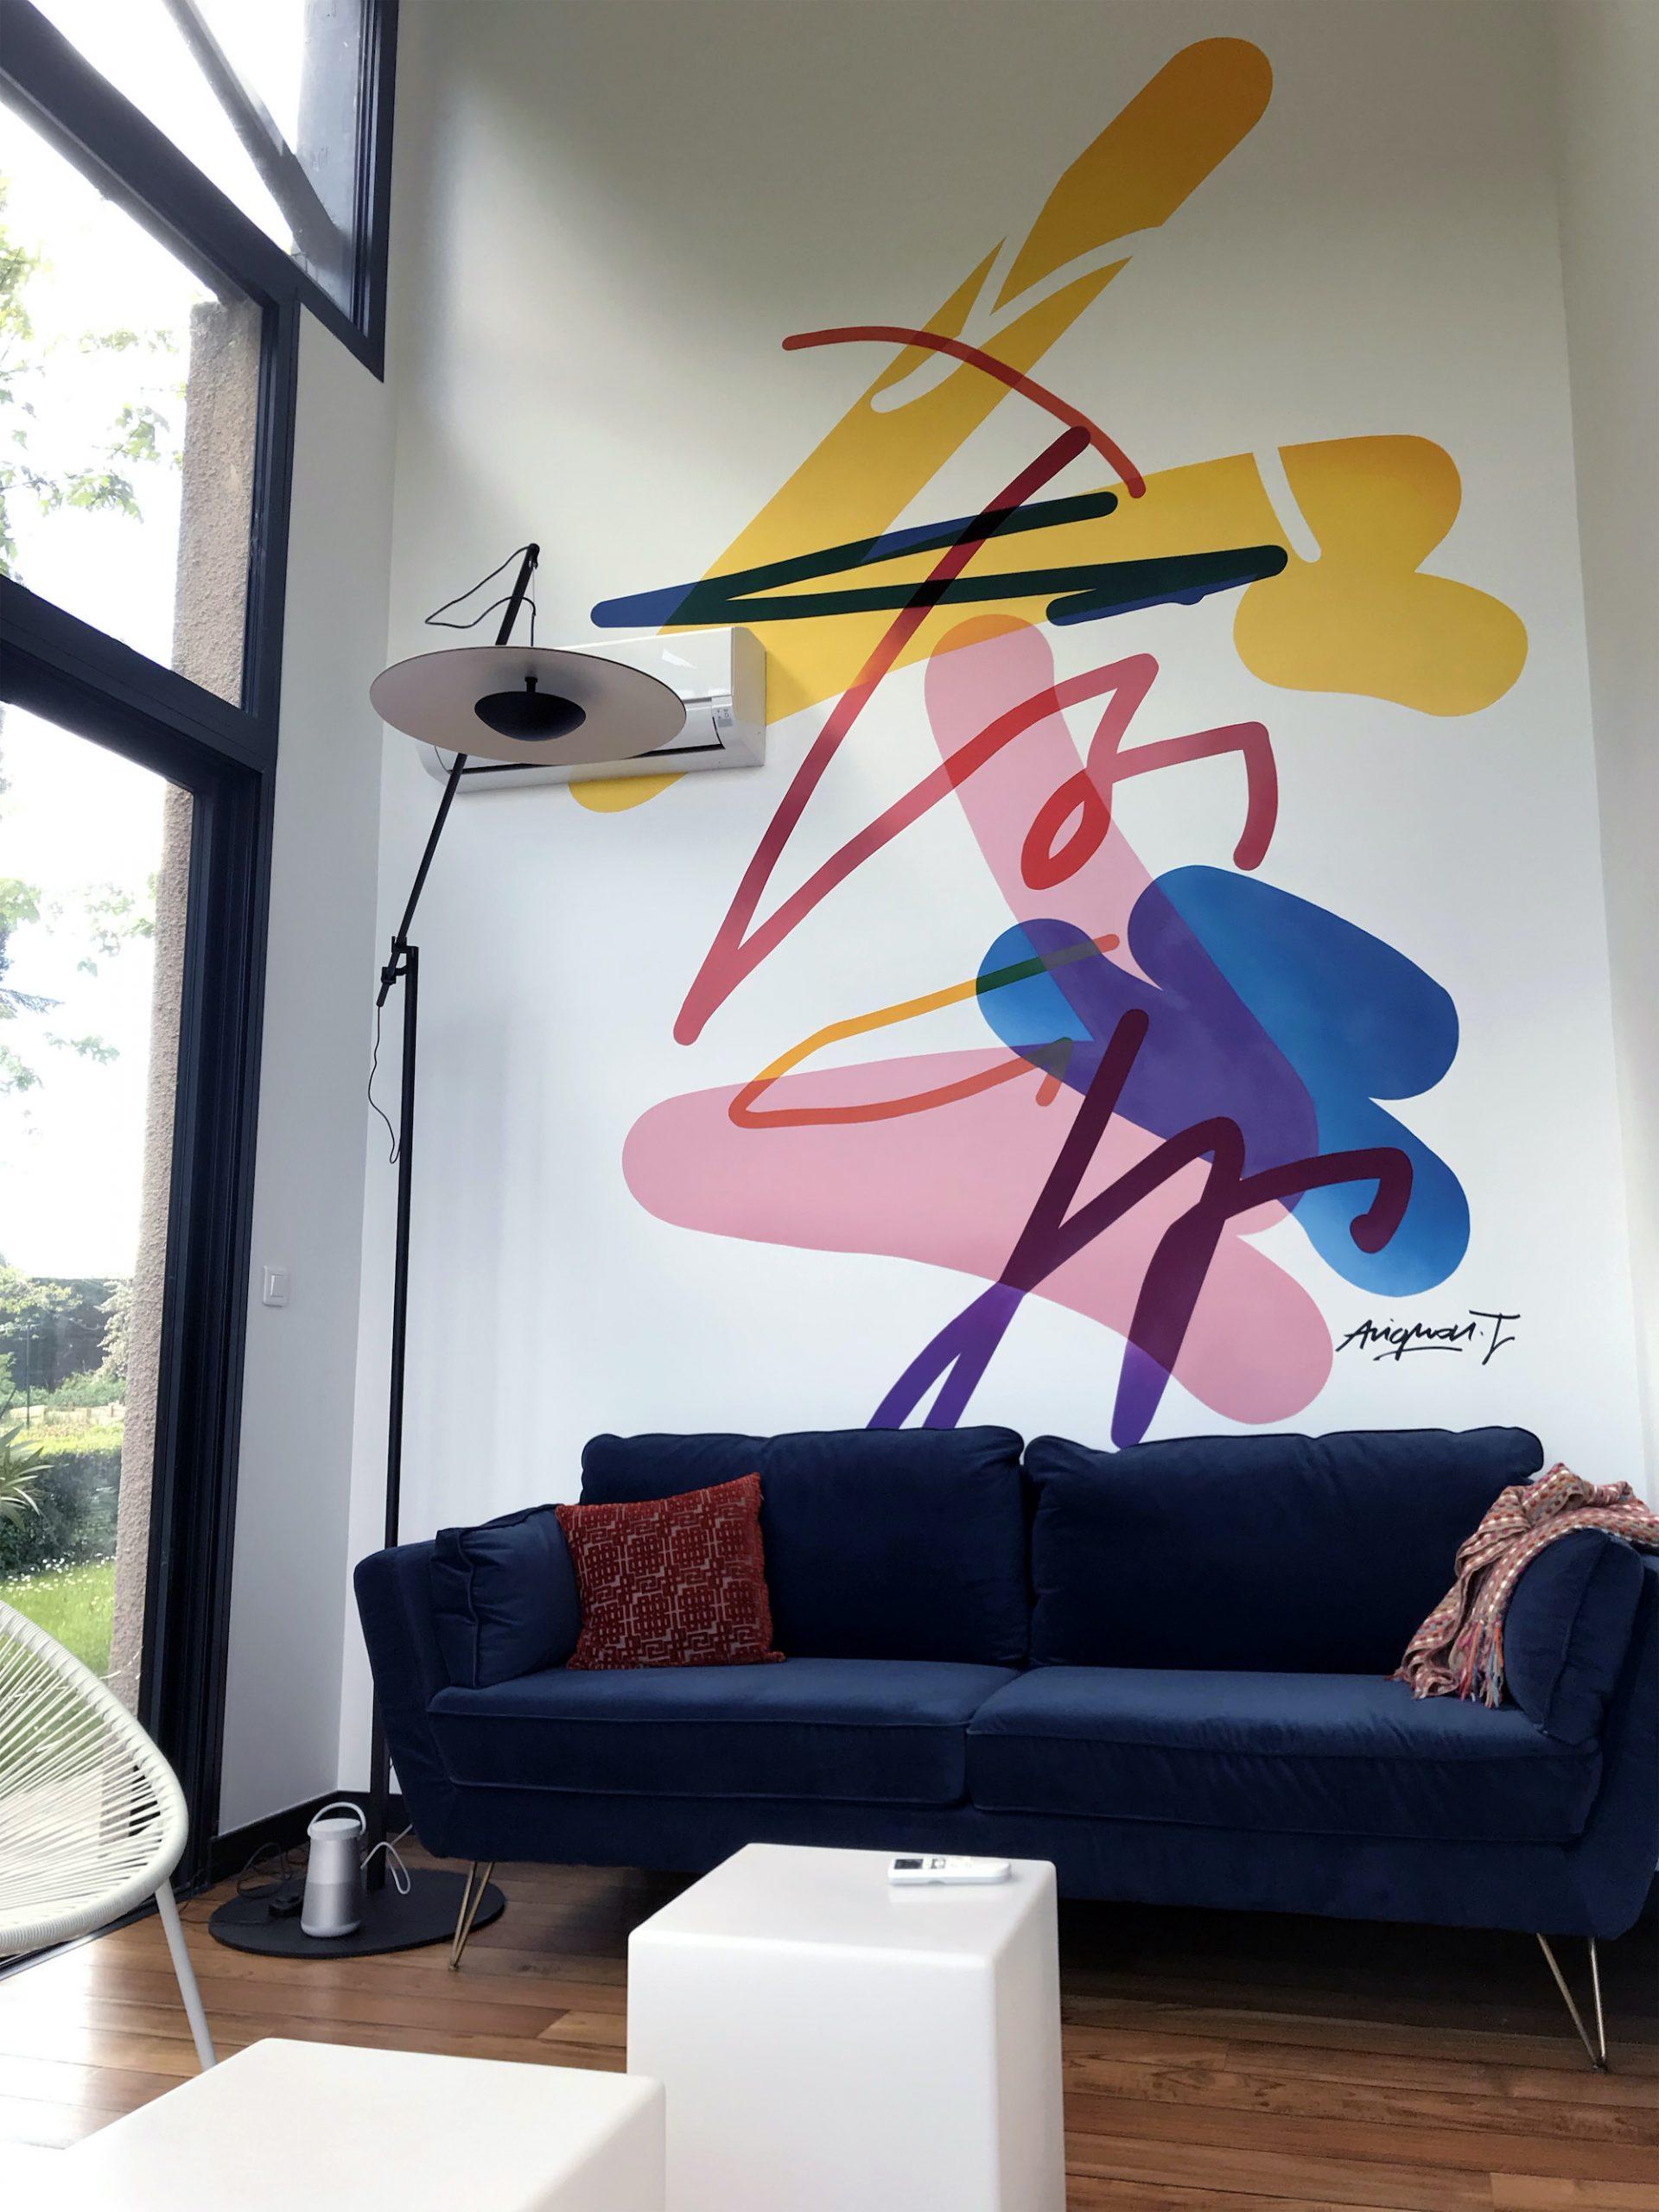 deco-interieur-graffiti-abstrait-streetart copie